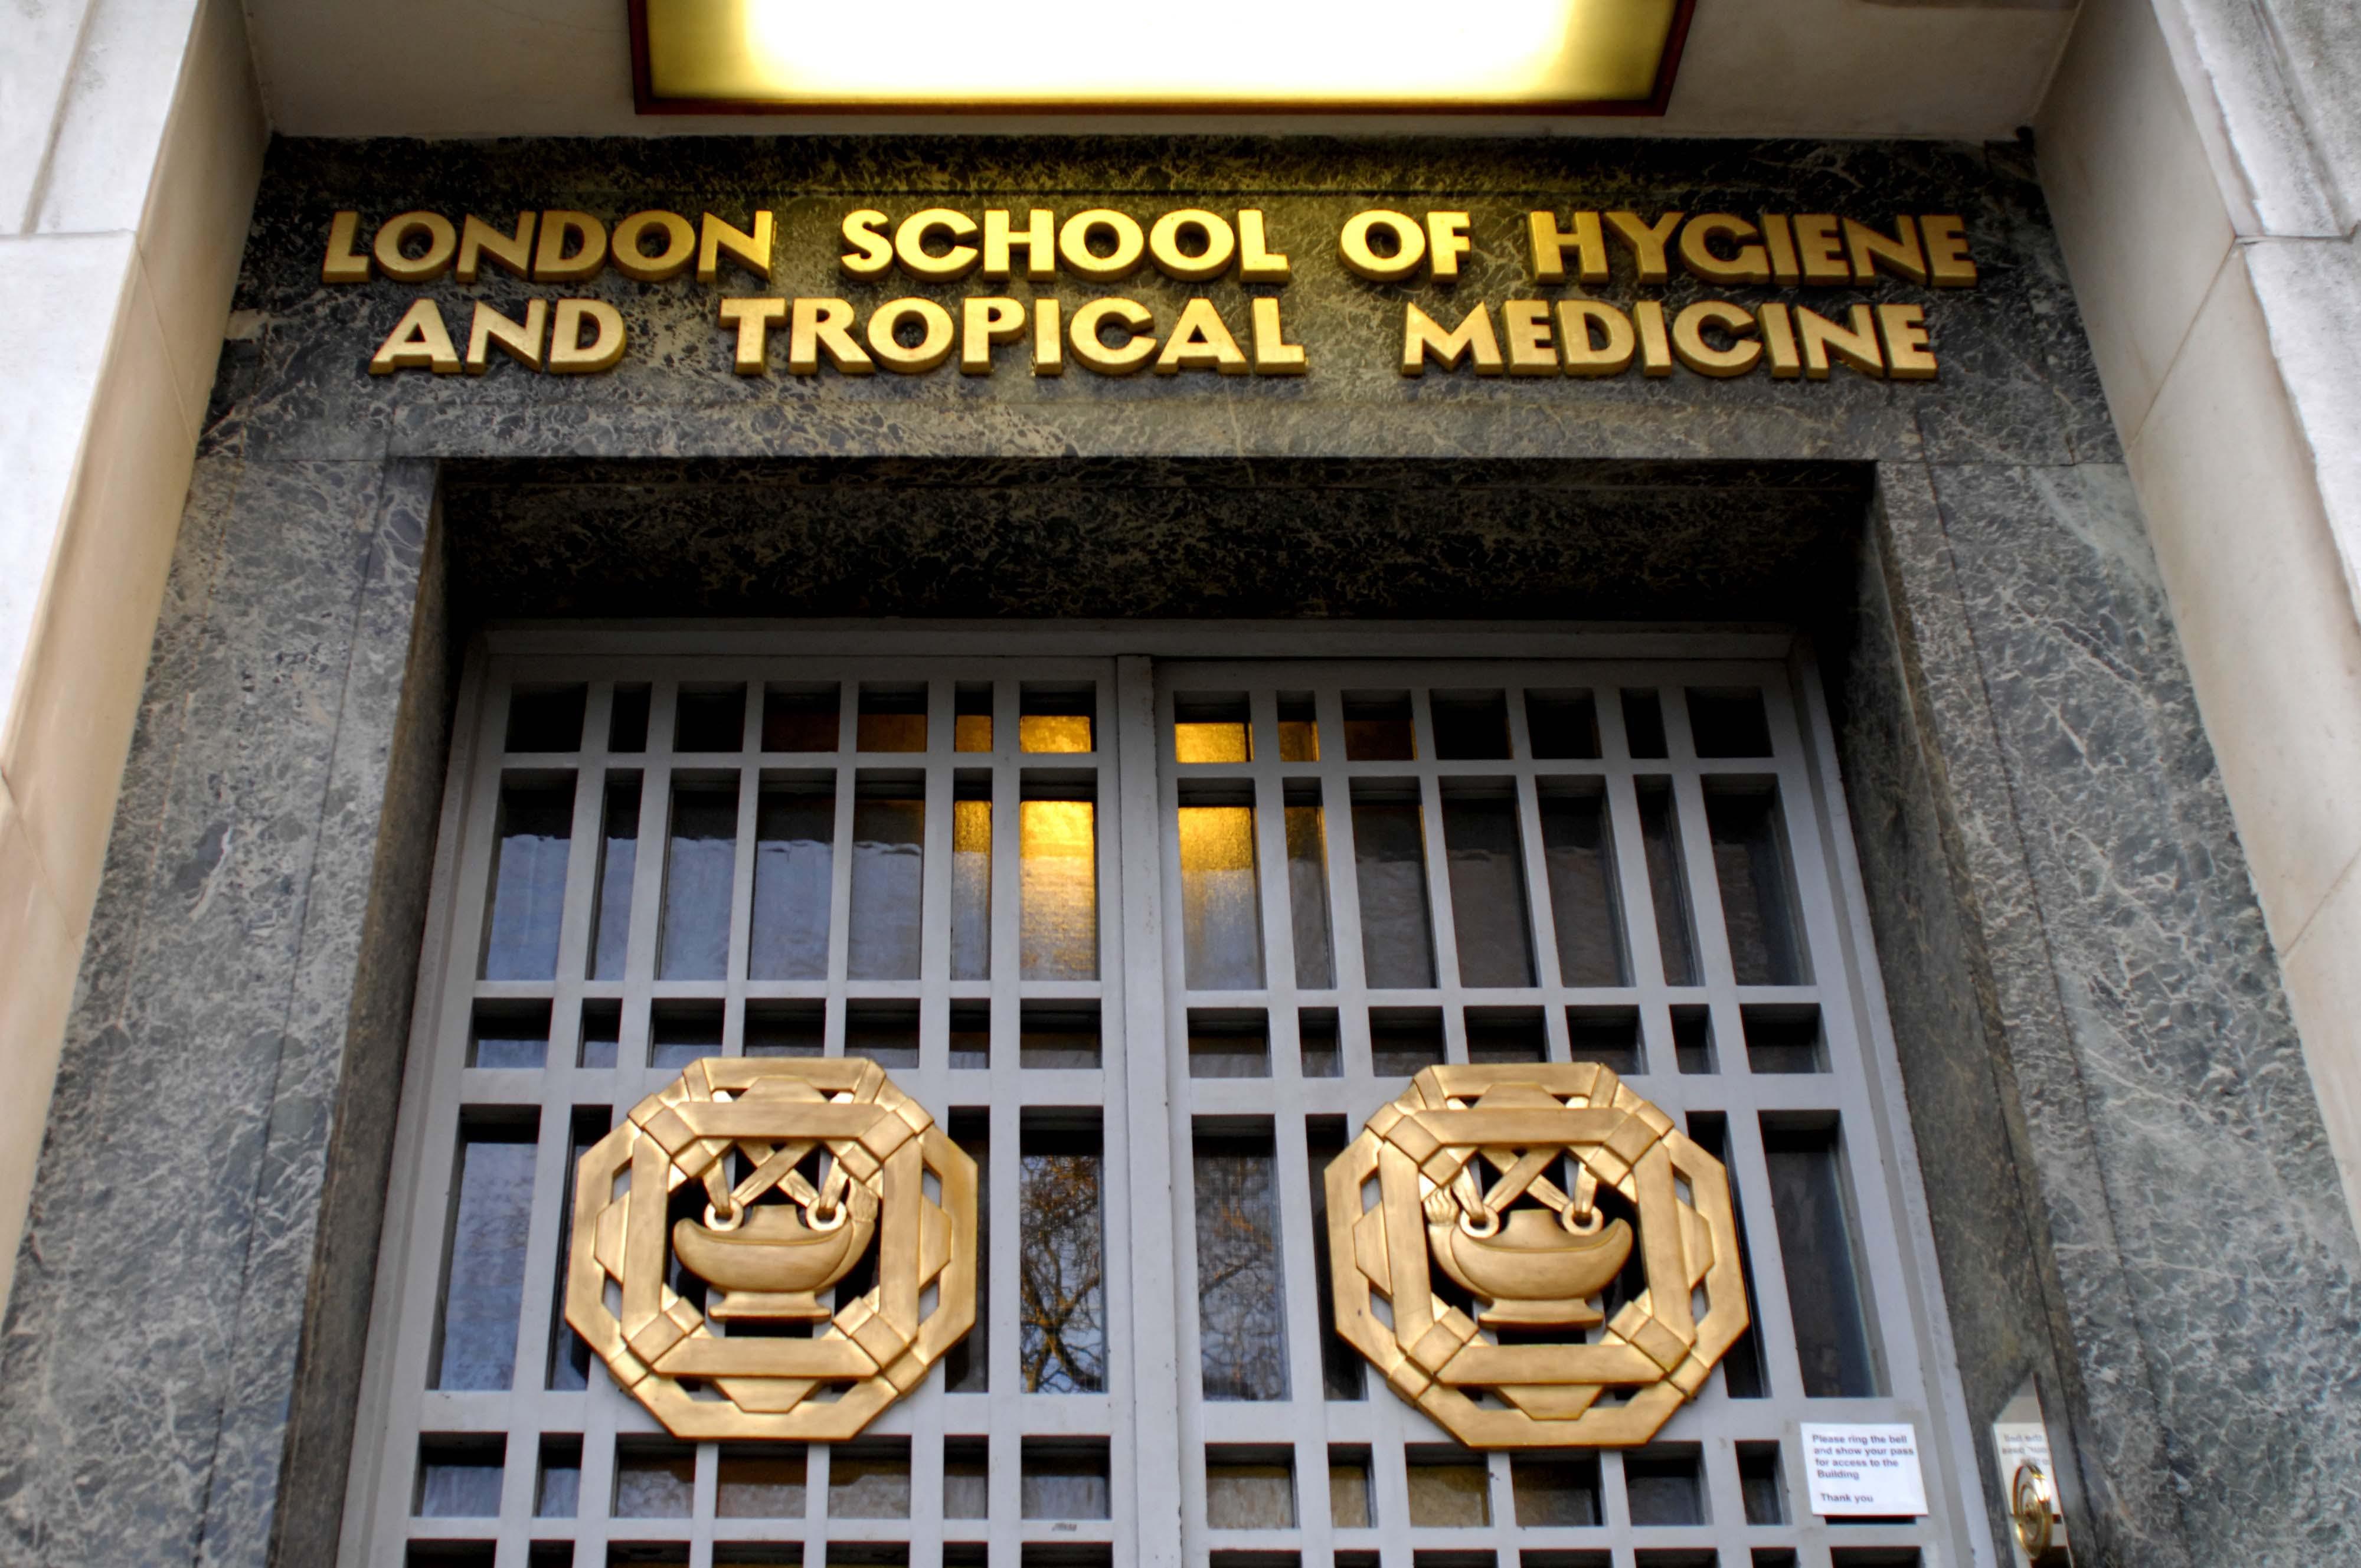 London School of Hygiene and Tropical Medicine - London